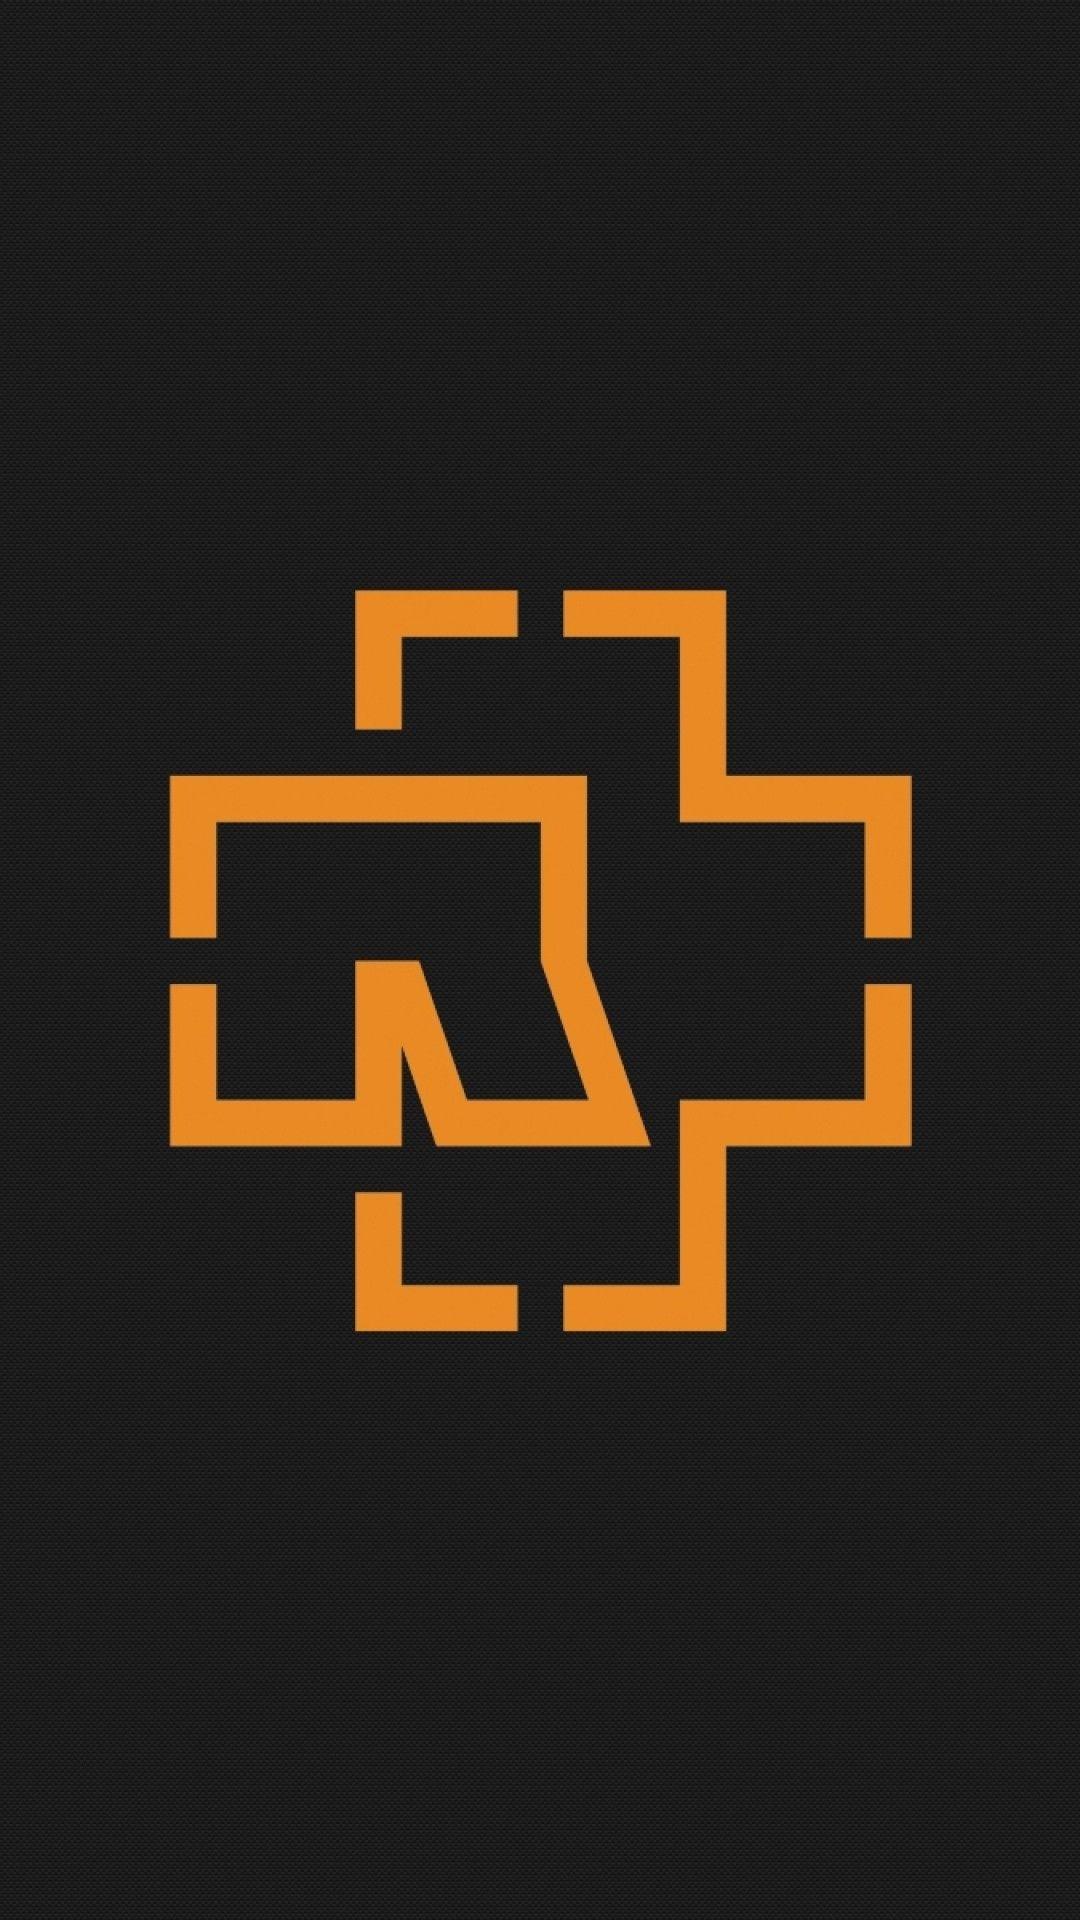 1080x1920 Preview Wallpaper Rammstein Symbol Background Graphics Orange 1080x1920 Rammstein Twenty One Pilots Wallpaper Wallpaper